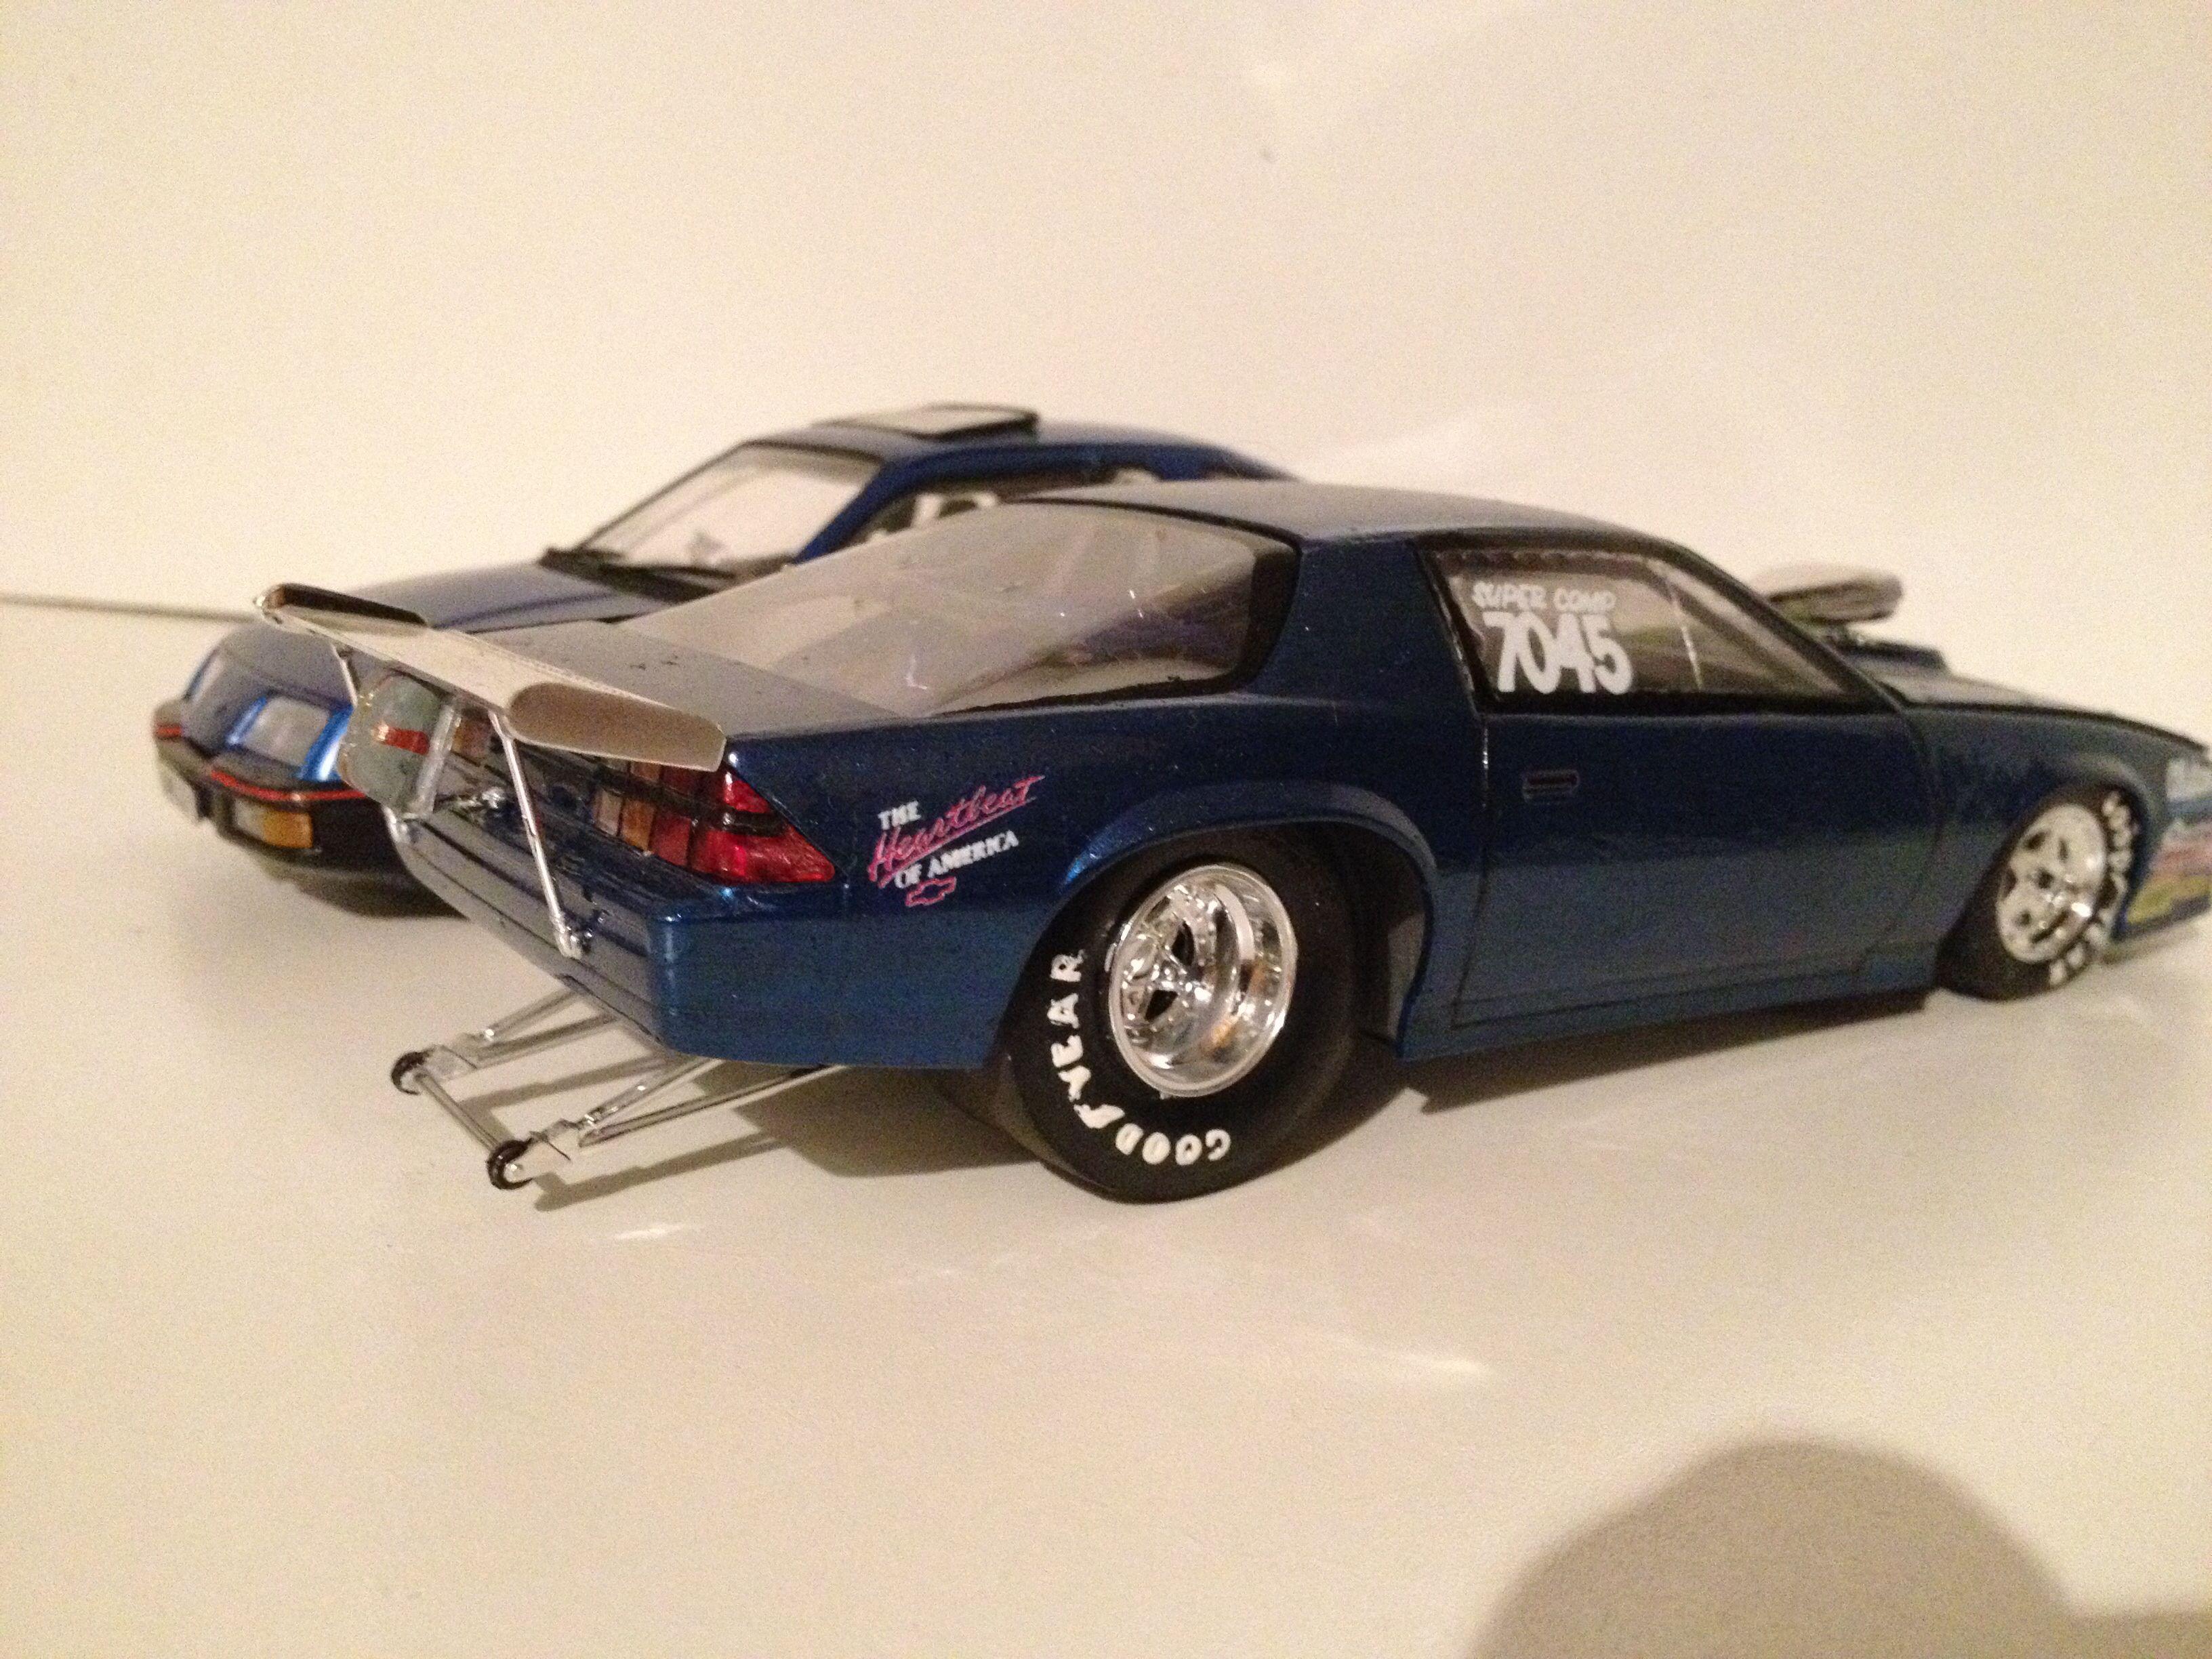 37 Best Car Model Kits Images On Pinterest Model Kits Plastic